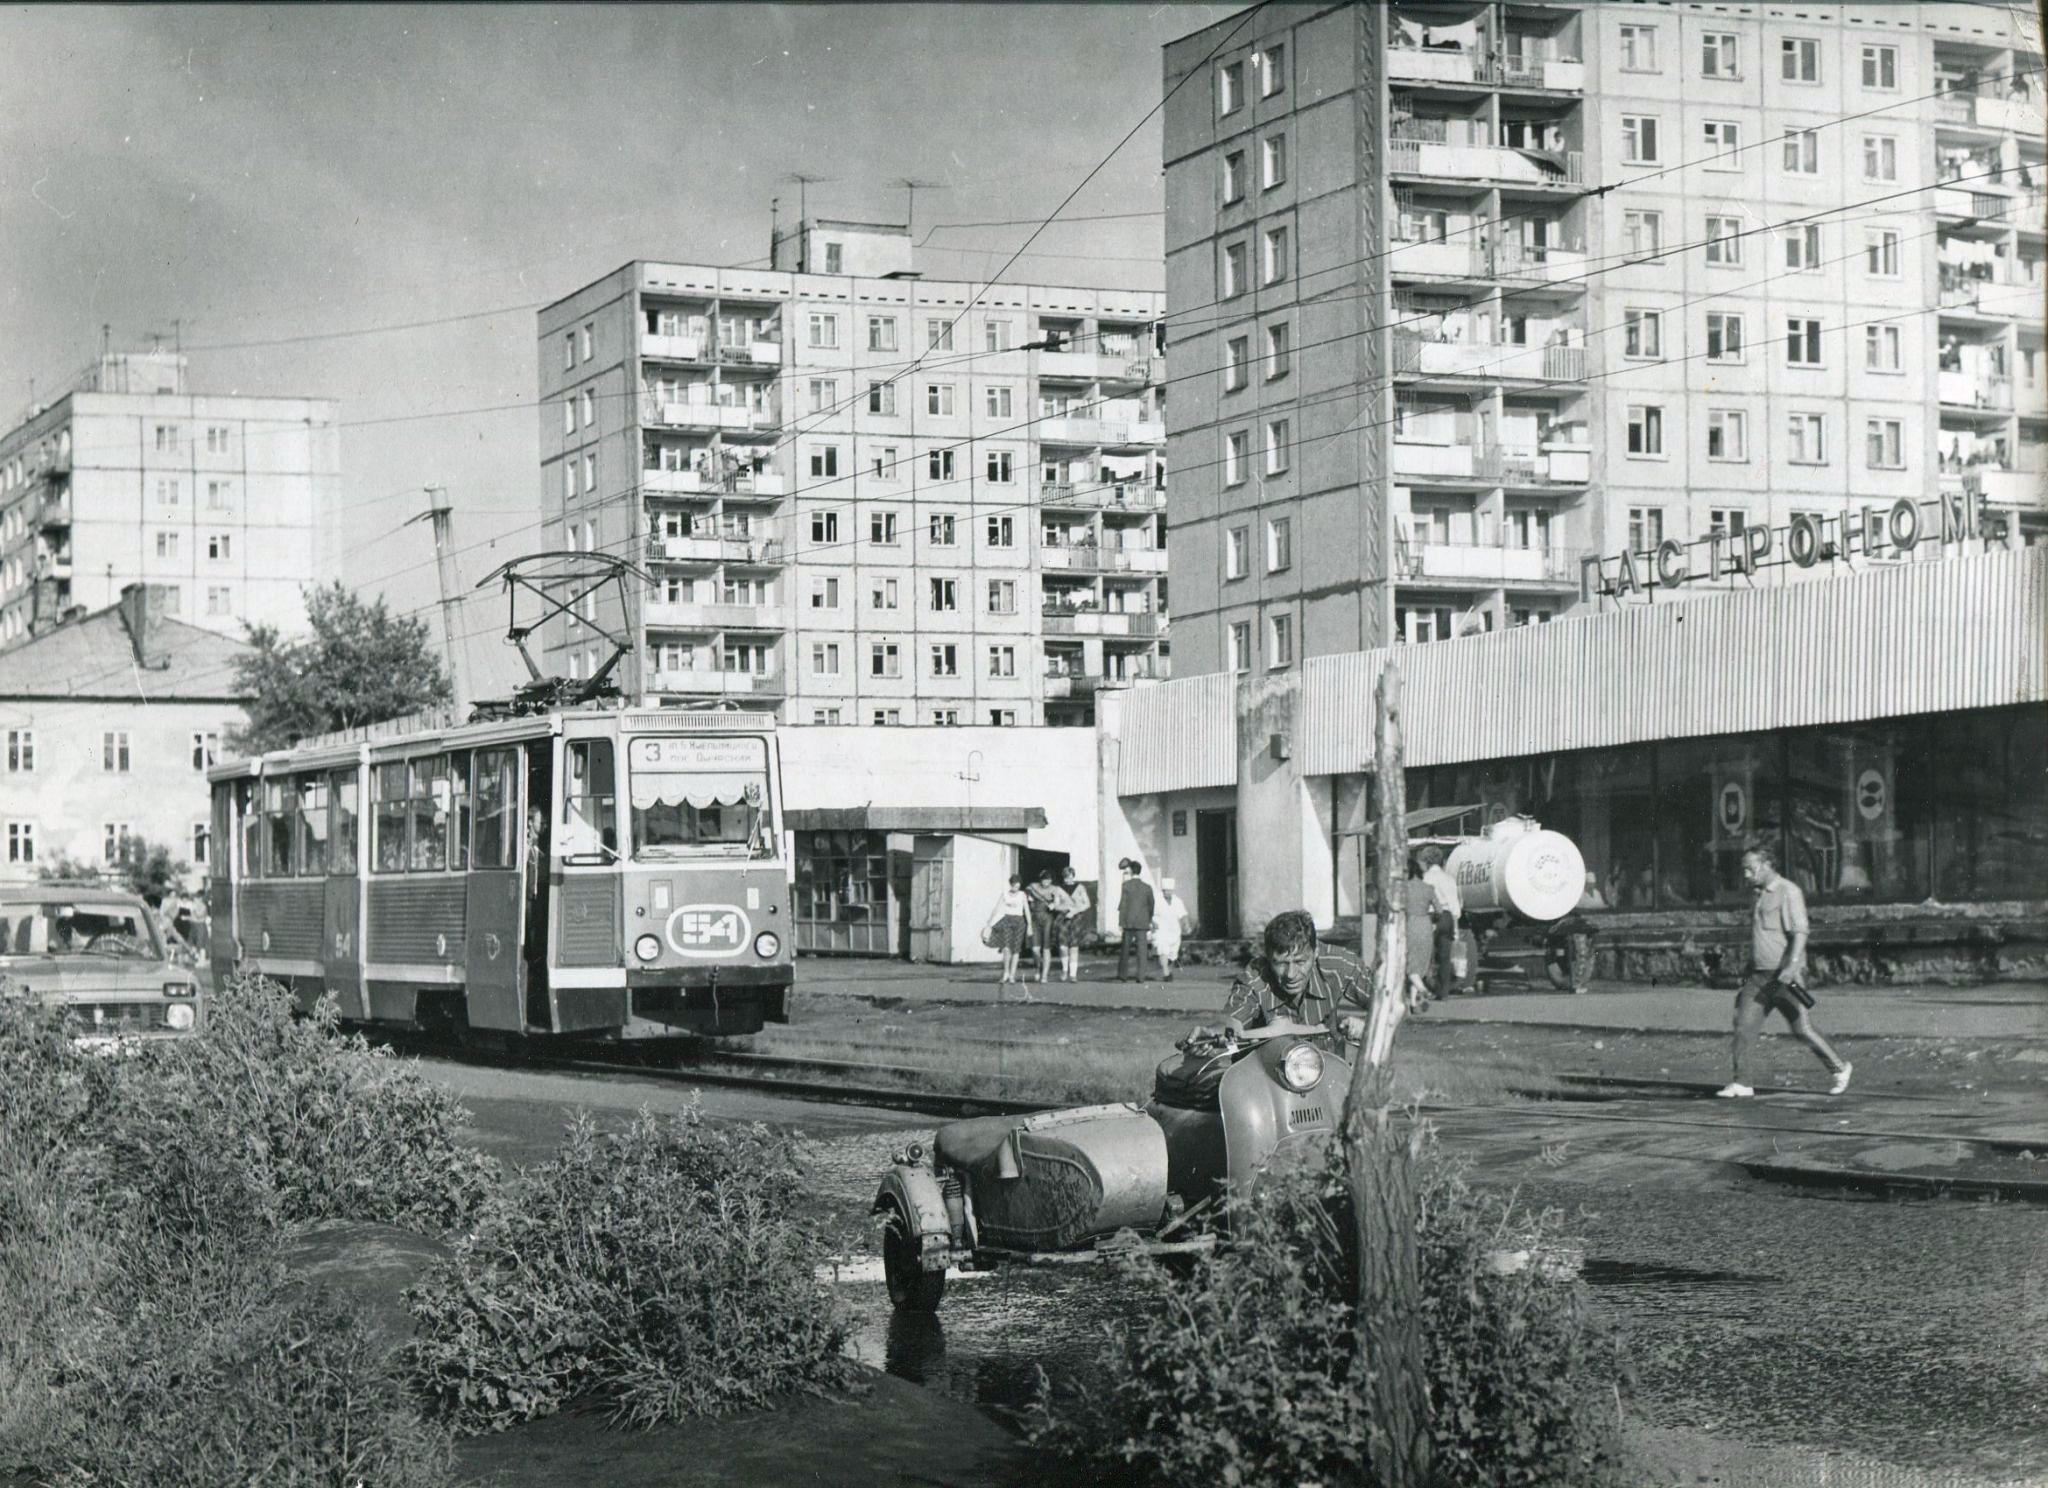 Омск, ул. Лермонтова. Дорога, мотоцикл, квас, трамвай. 1984 г.